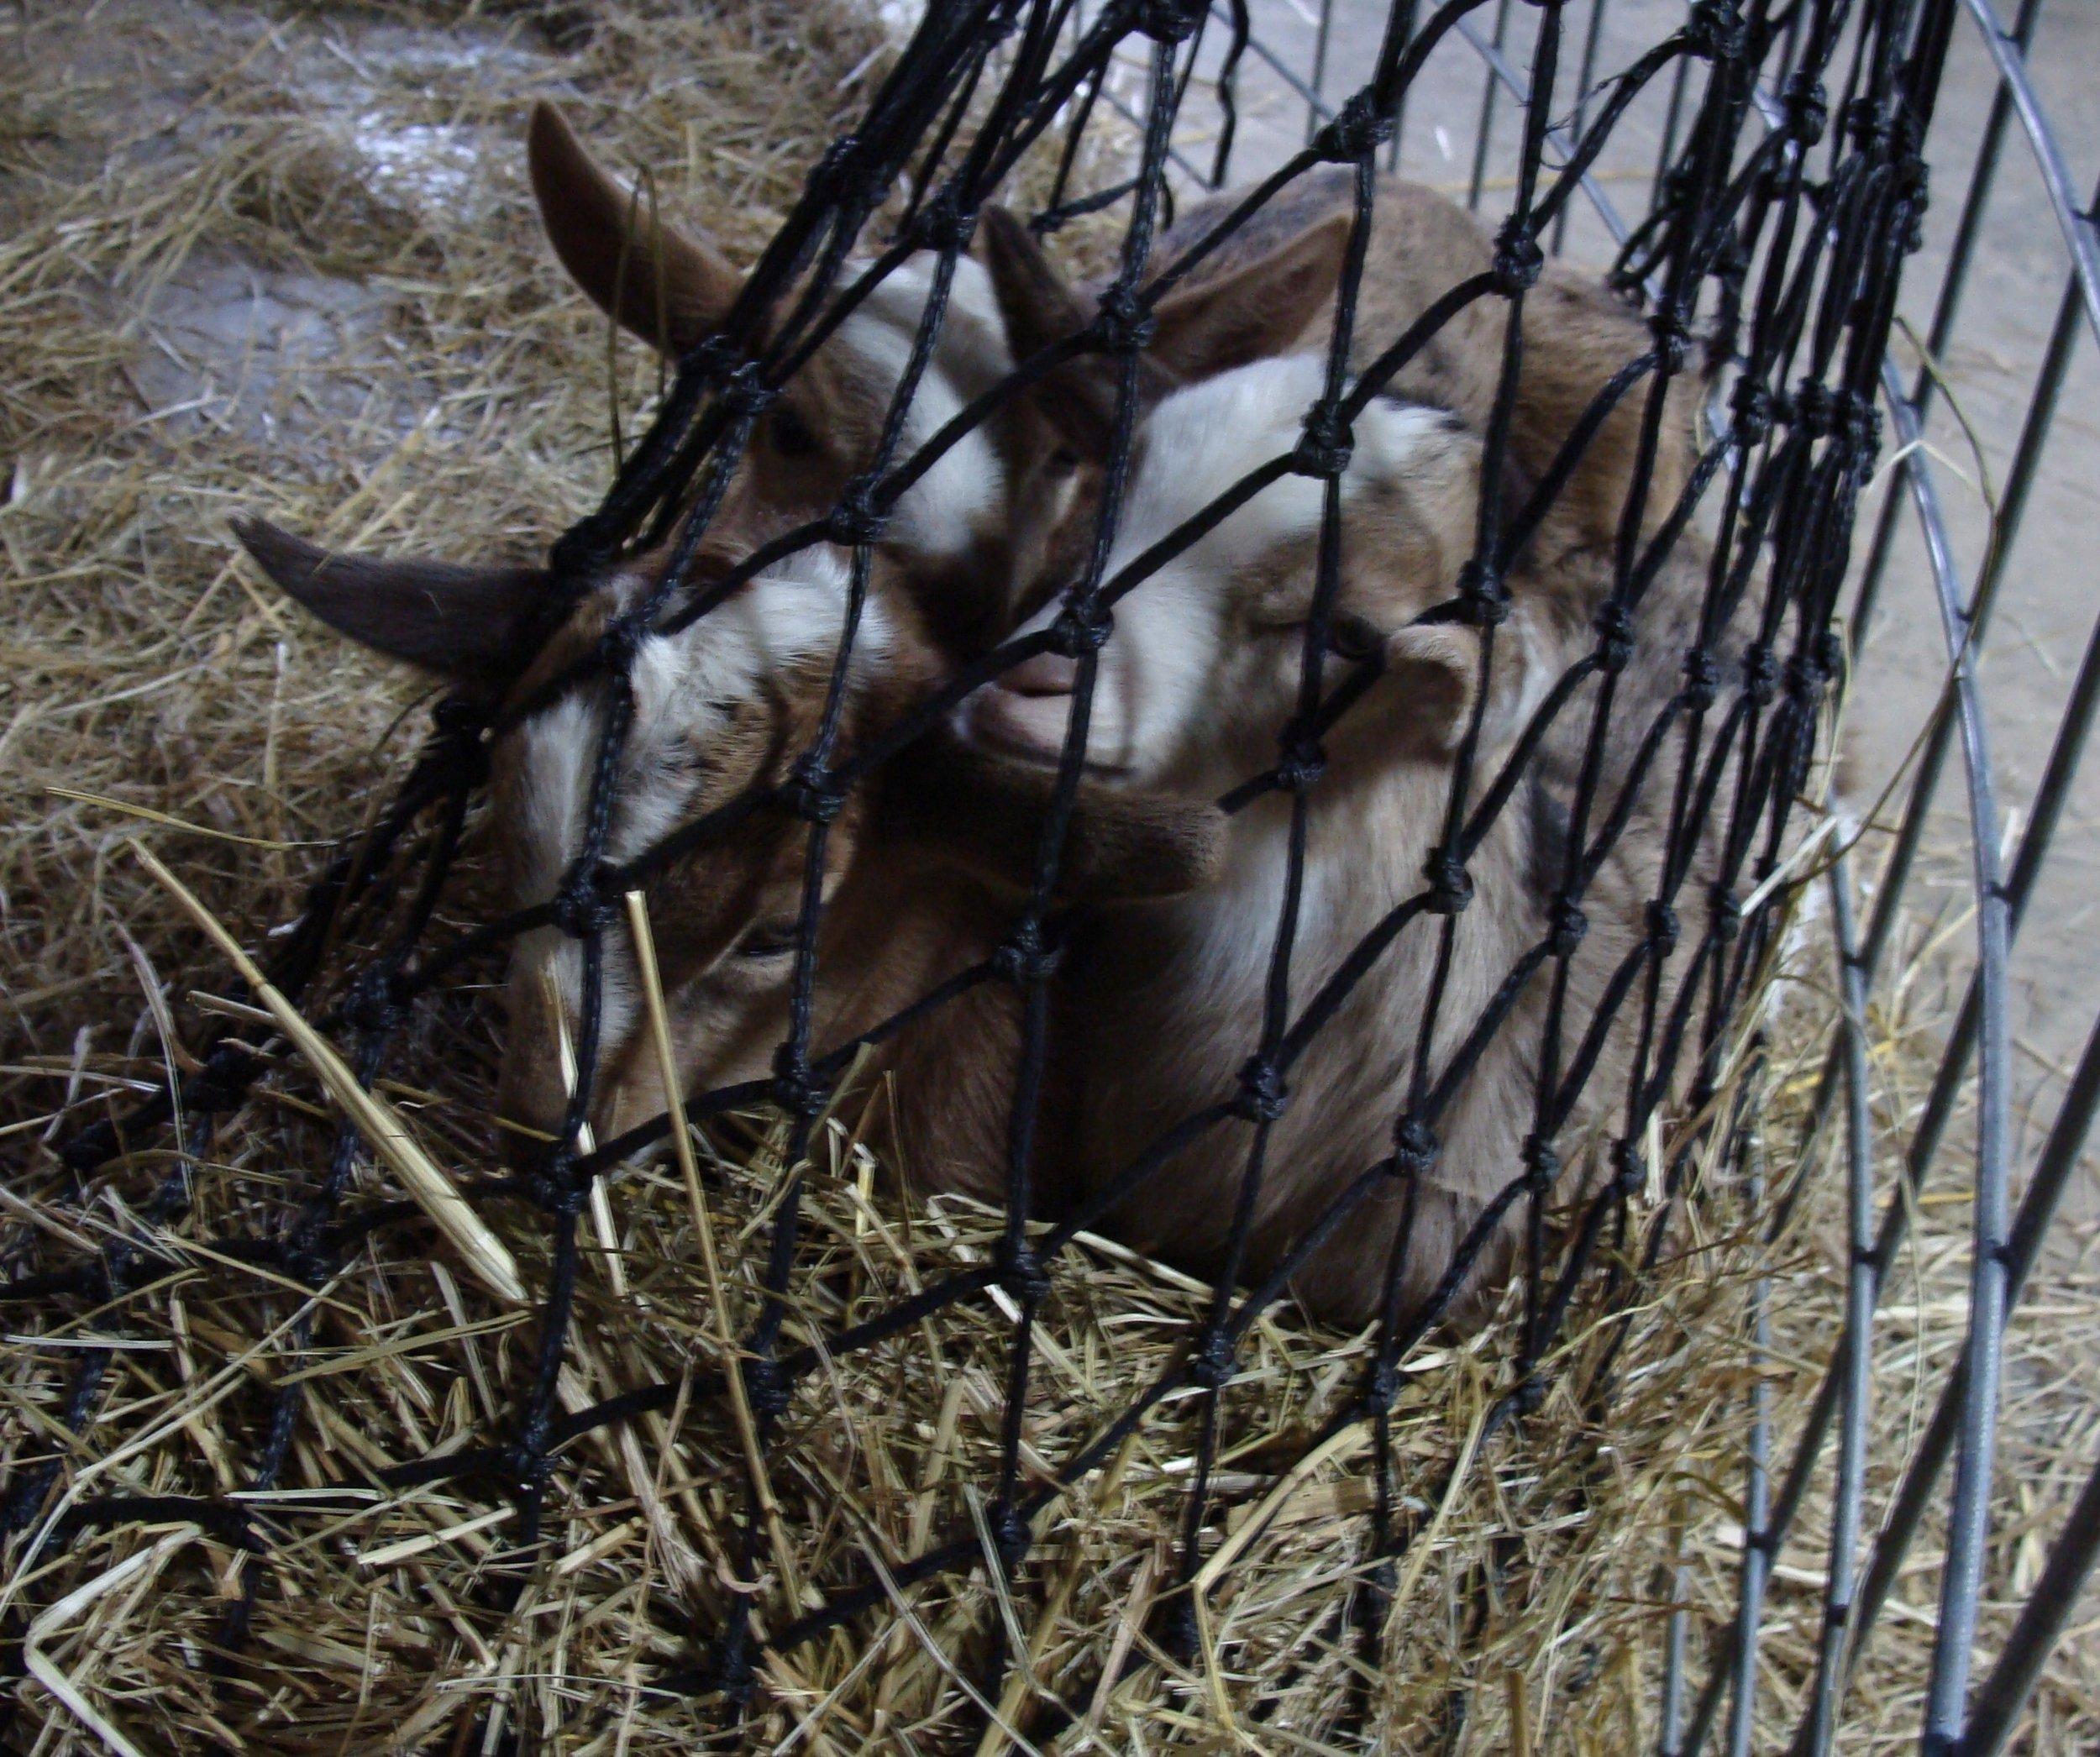 baby goats in hay bag